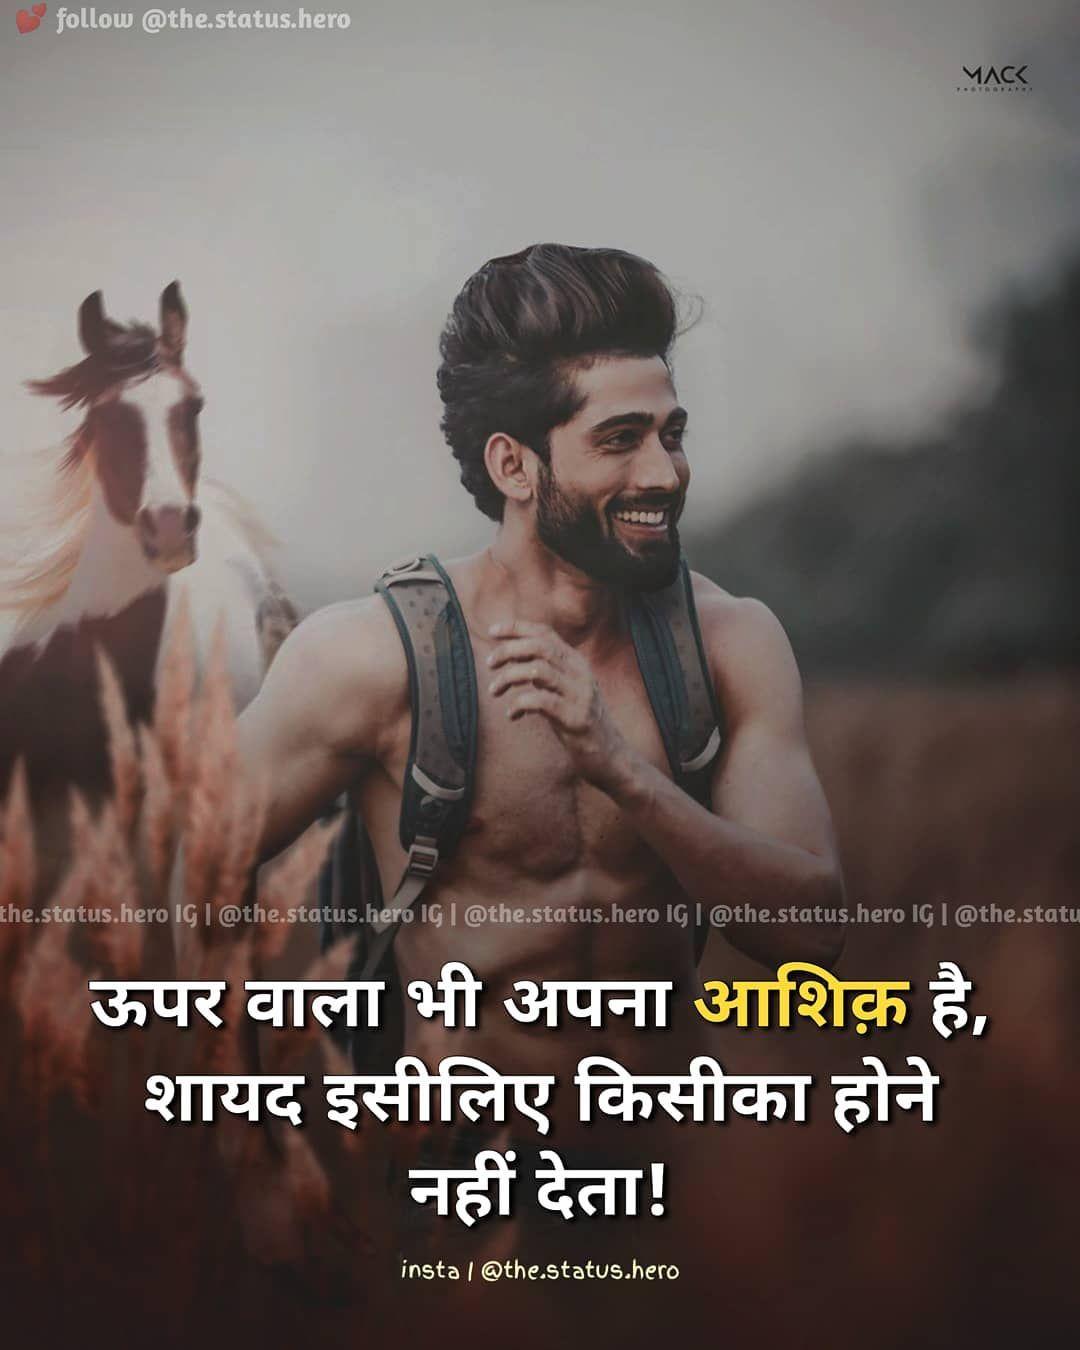 "Attitude Quotes In Hindi : attitude, quotes, hindi, 5,271, Likes,, Comments, Statushero, (@the.status.hero), Instagram:, ""Single, 😩😶😣....."", Special, Quotes,, Funny, Attitude, Hindi, Quotes, Images"